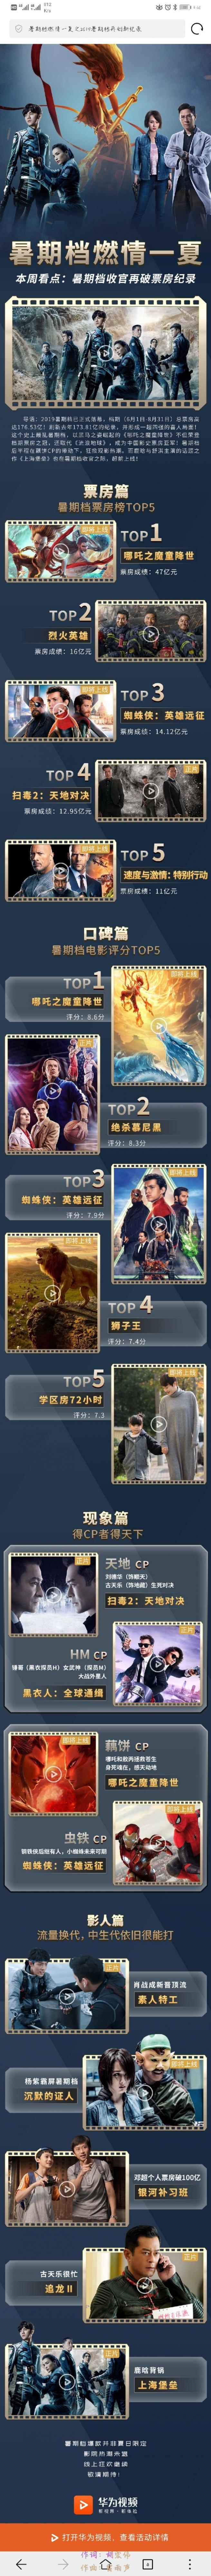 Screenshot_20190908_164005_com.huawei.browser.jpg